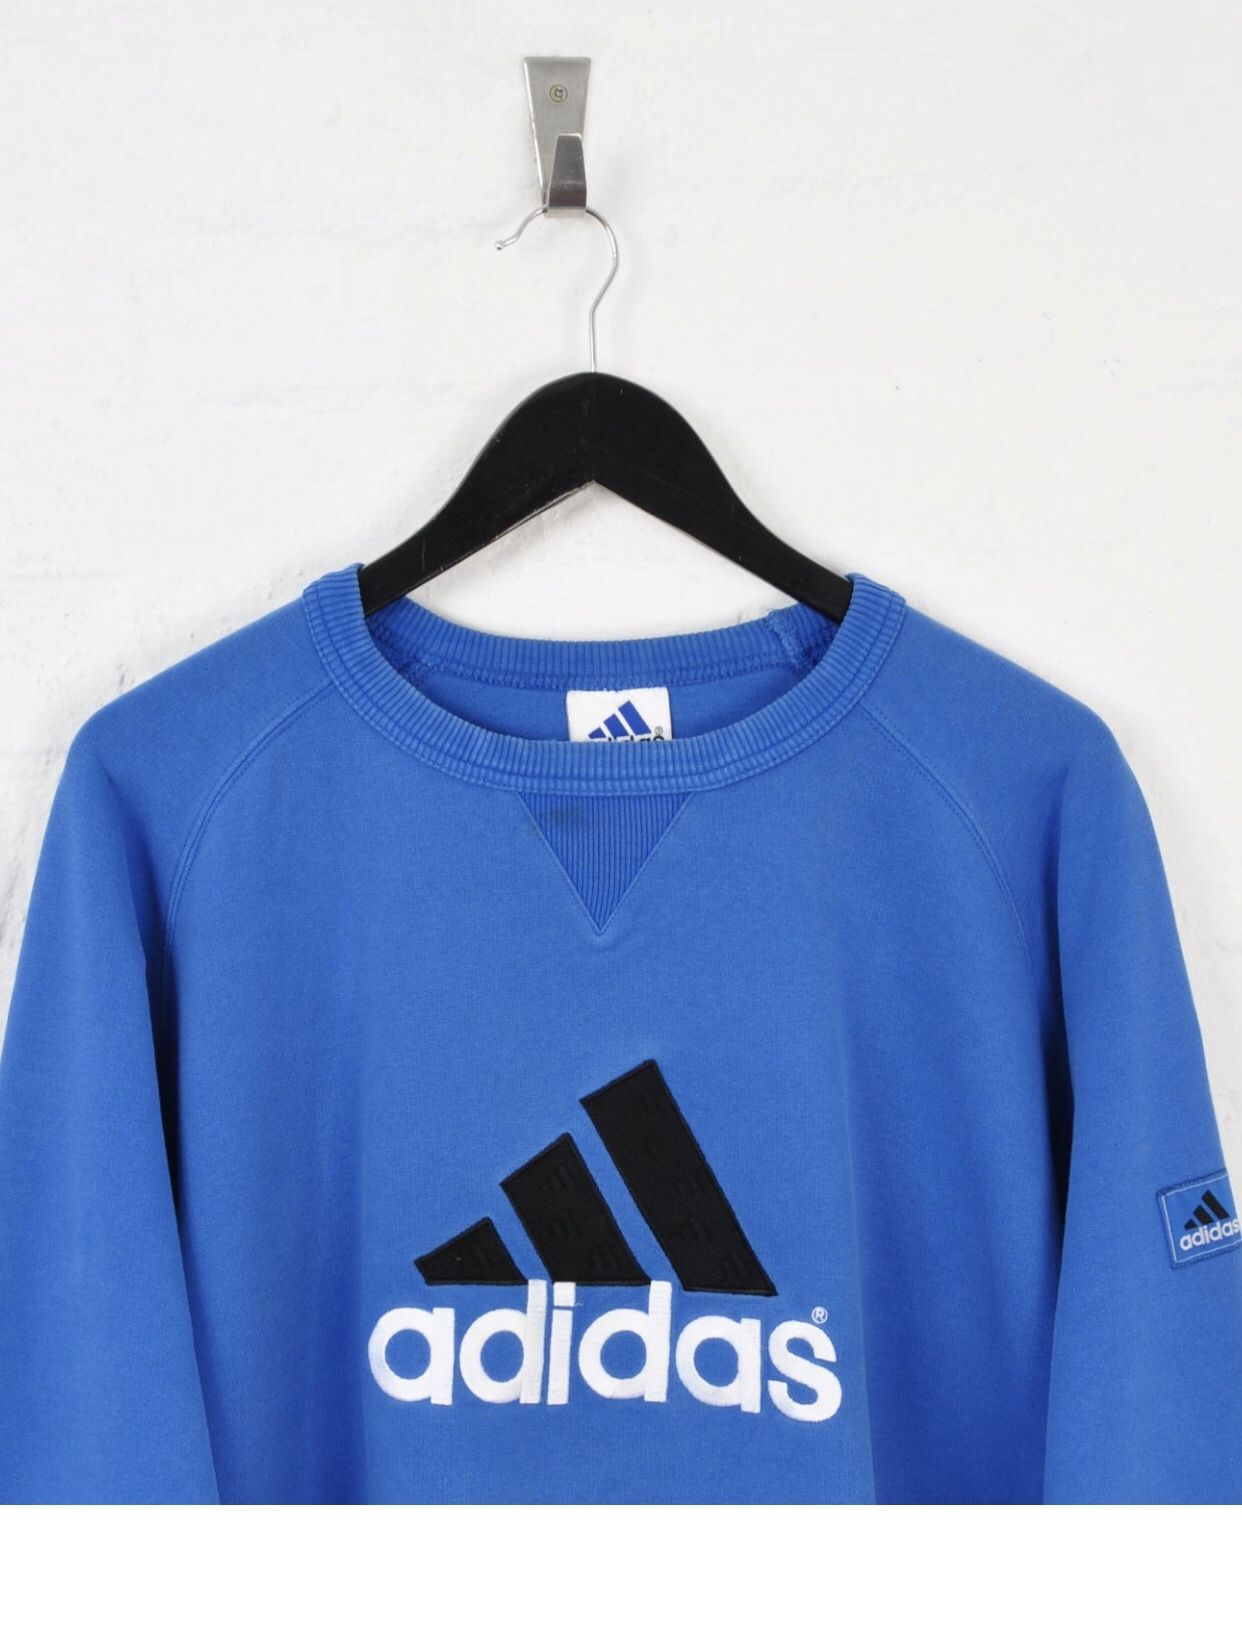 Adidas Blue Sweater